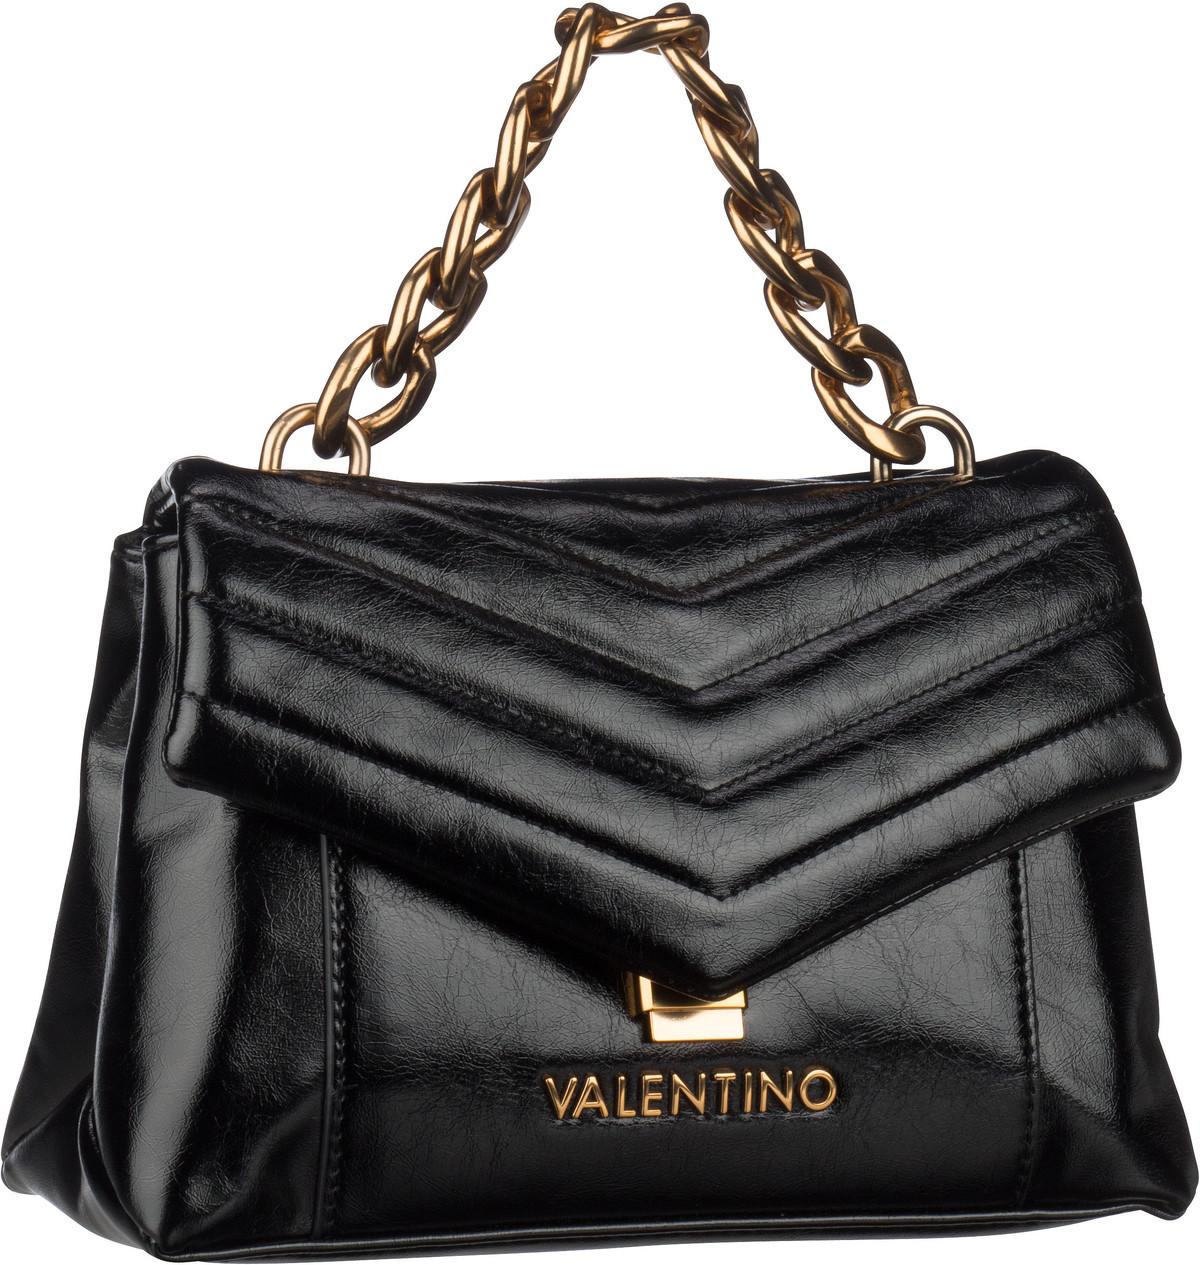 Bags Handtasche Grifone Cartella W04 Nero